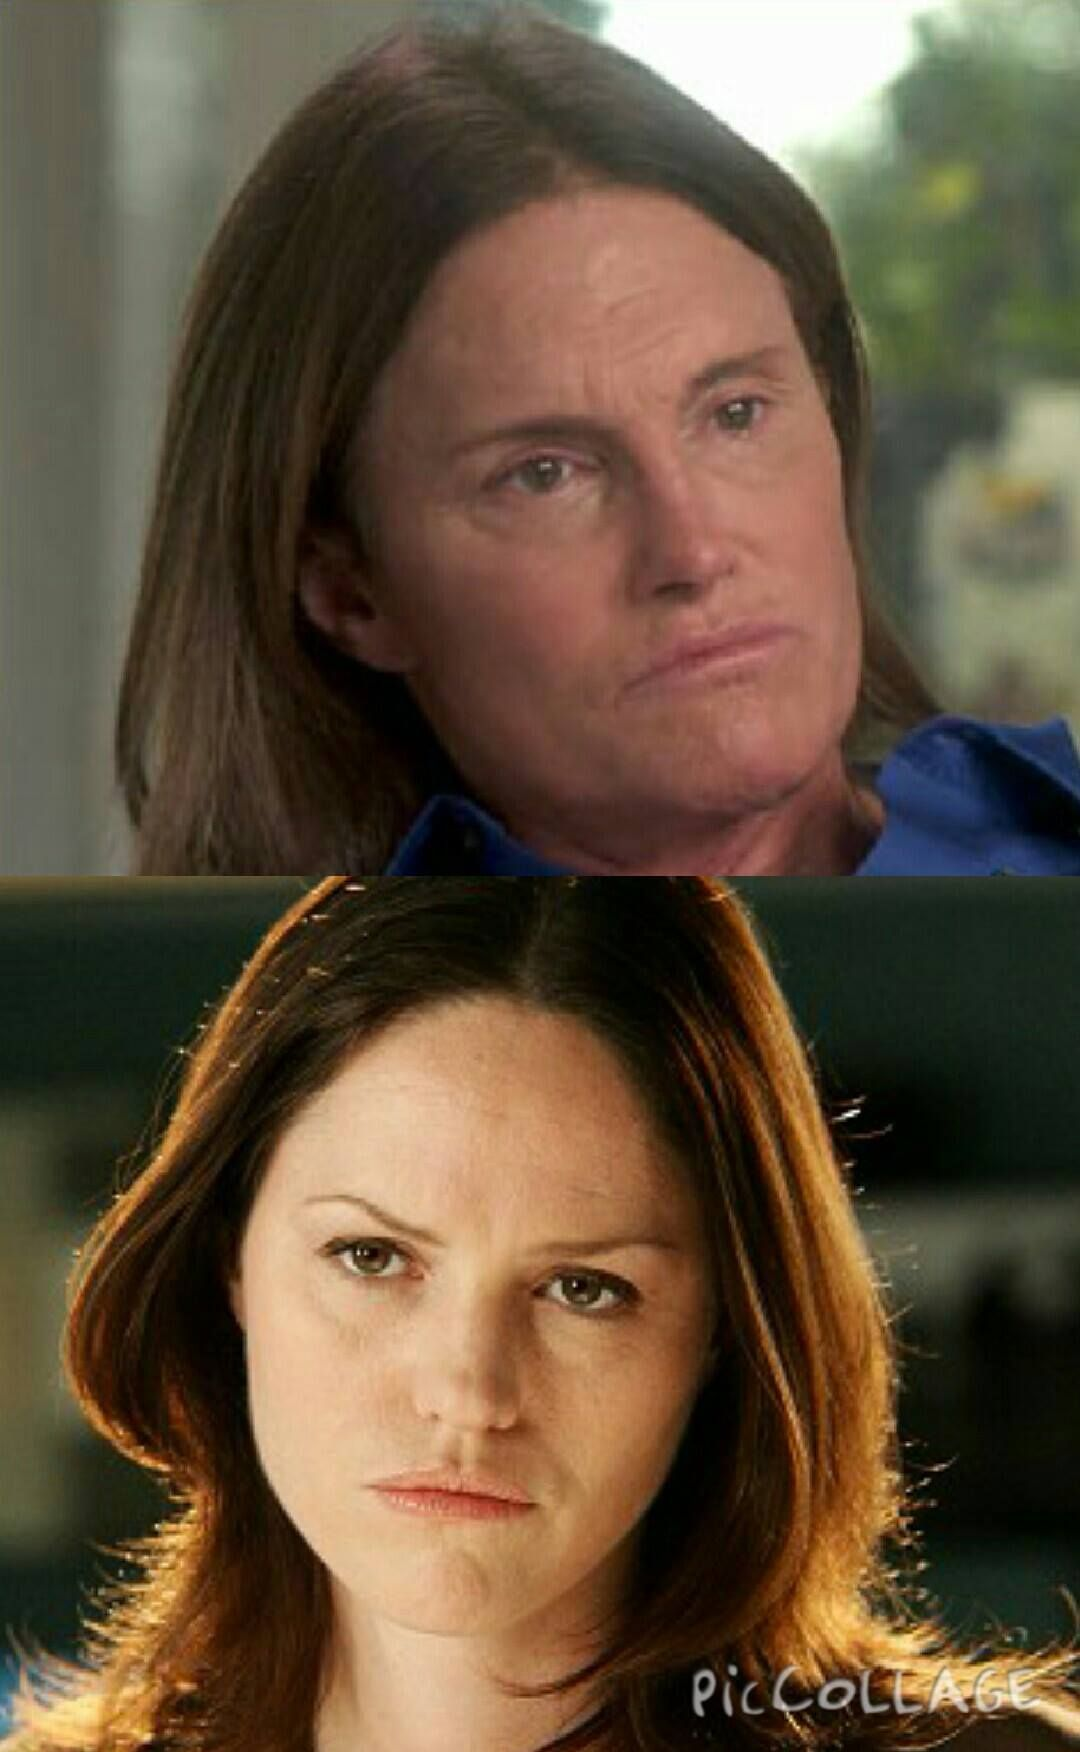 Bruce Jenner/Jorja Fox = Twins! #brucejenner #jorjafox #doppelgangers #celebtwins #sarasidle #kardashian